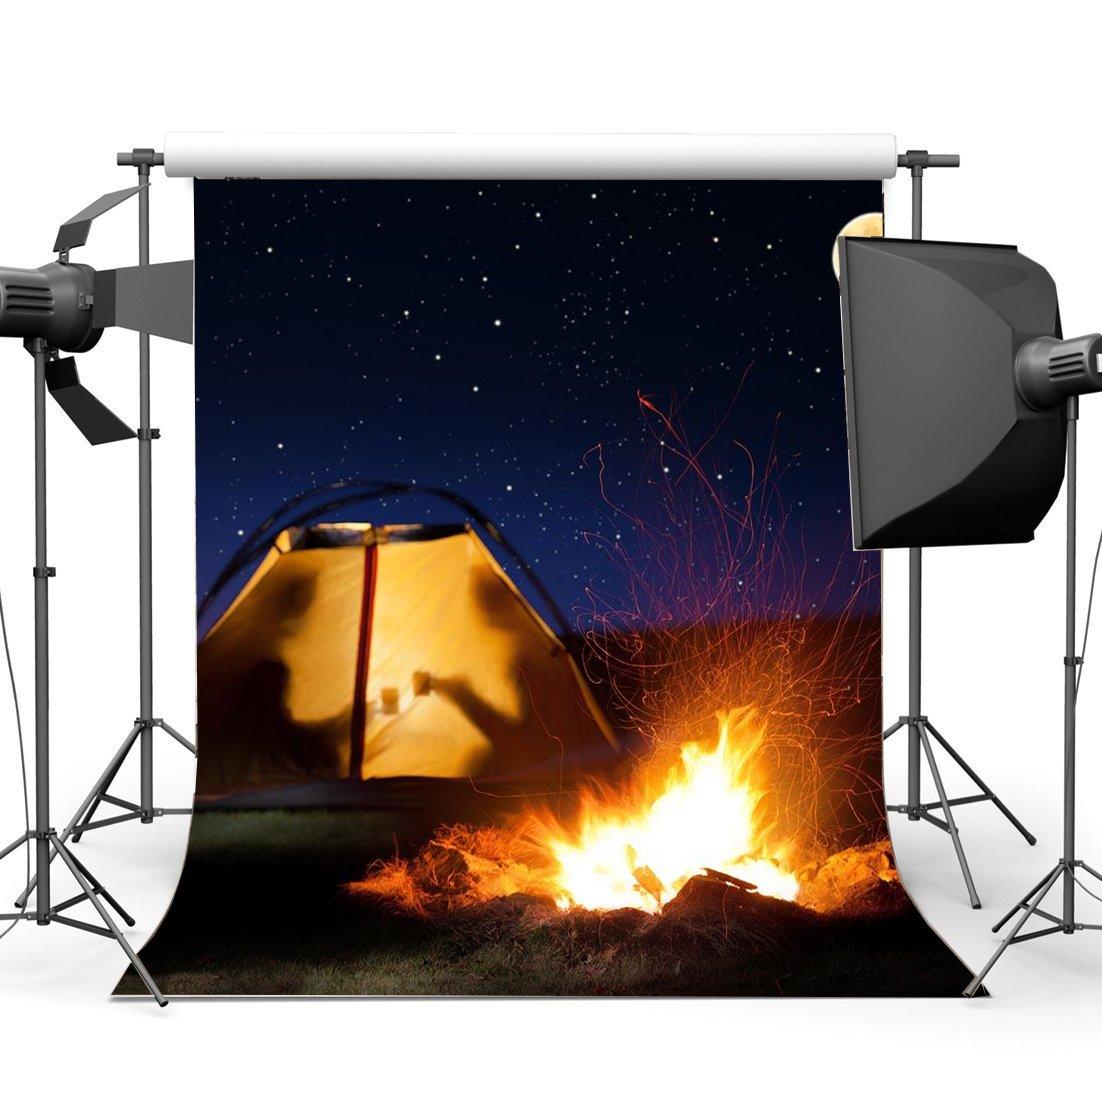 gladbuy Summer Camp Backdrop 5 x 7ftビニールTwinkle Starry Sky Shining Moon Night BackdropsアウトドアハイキングテントBonfire写真背景のスポーツWild Adventure Journeyフォトスタジオ小道具bl43   B07DPFMWGJ